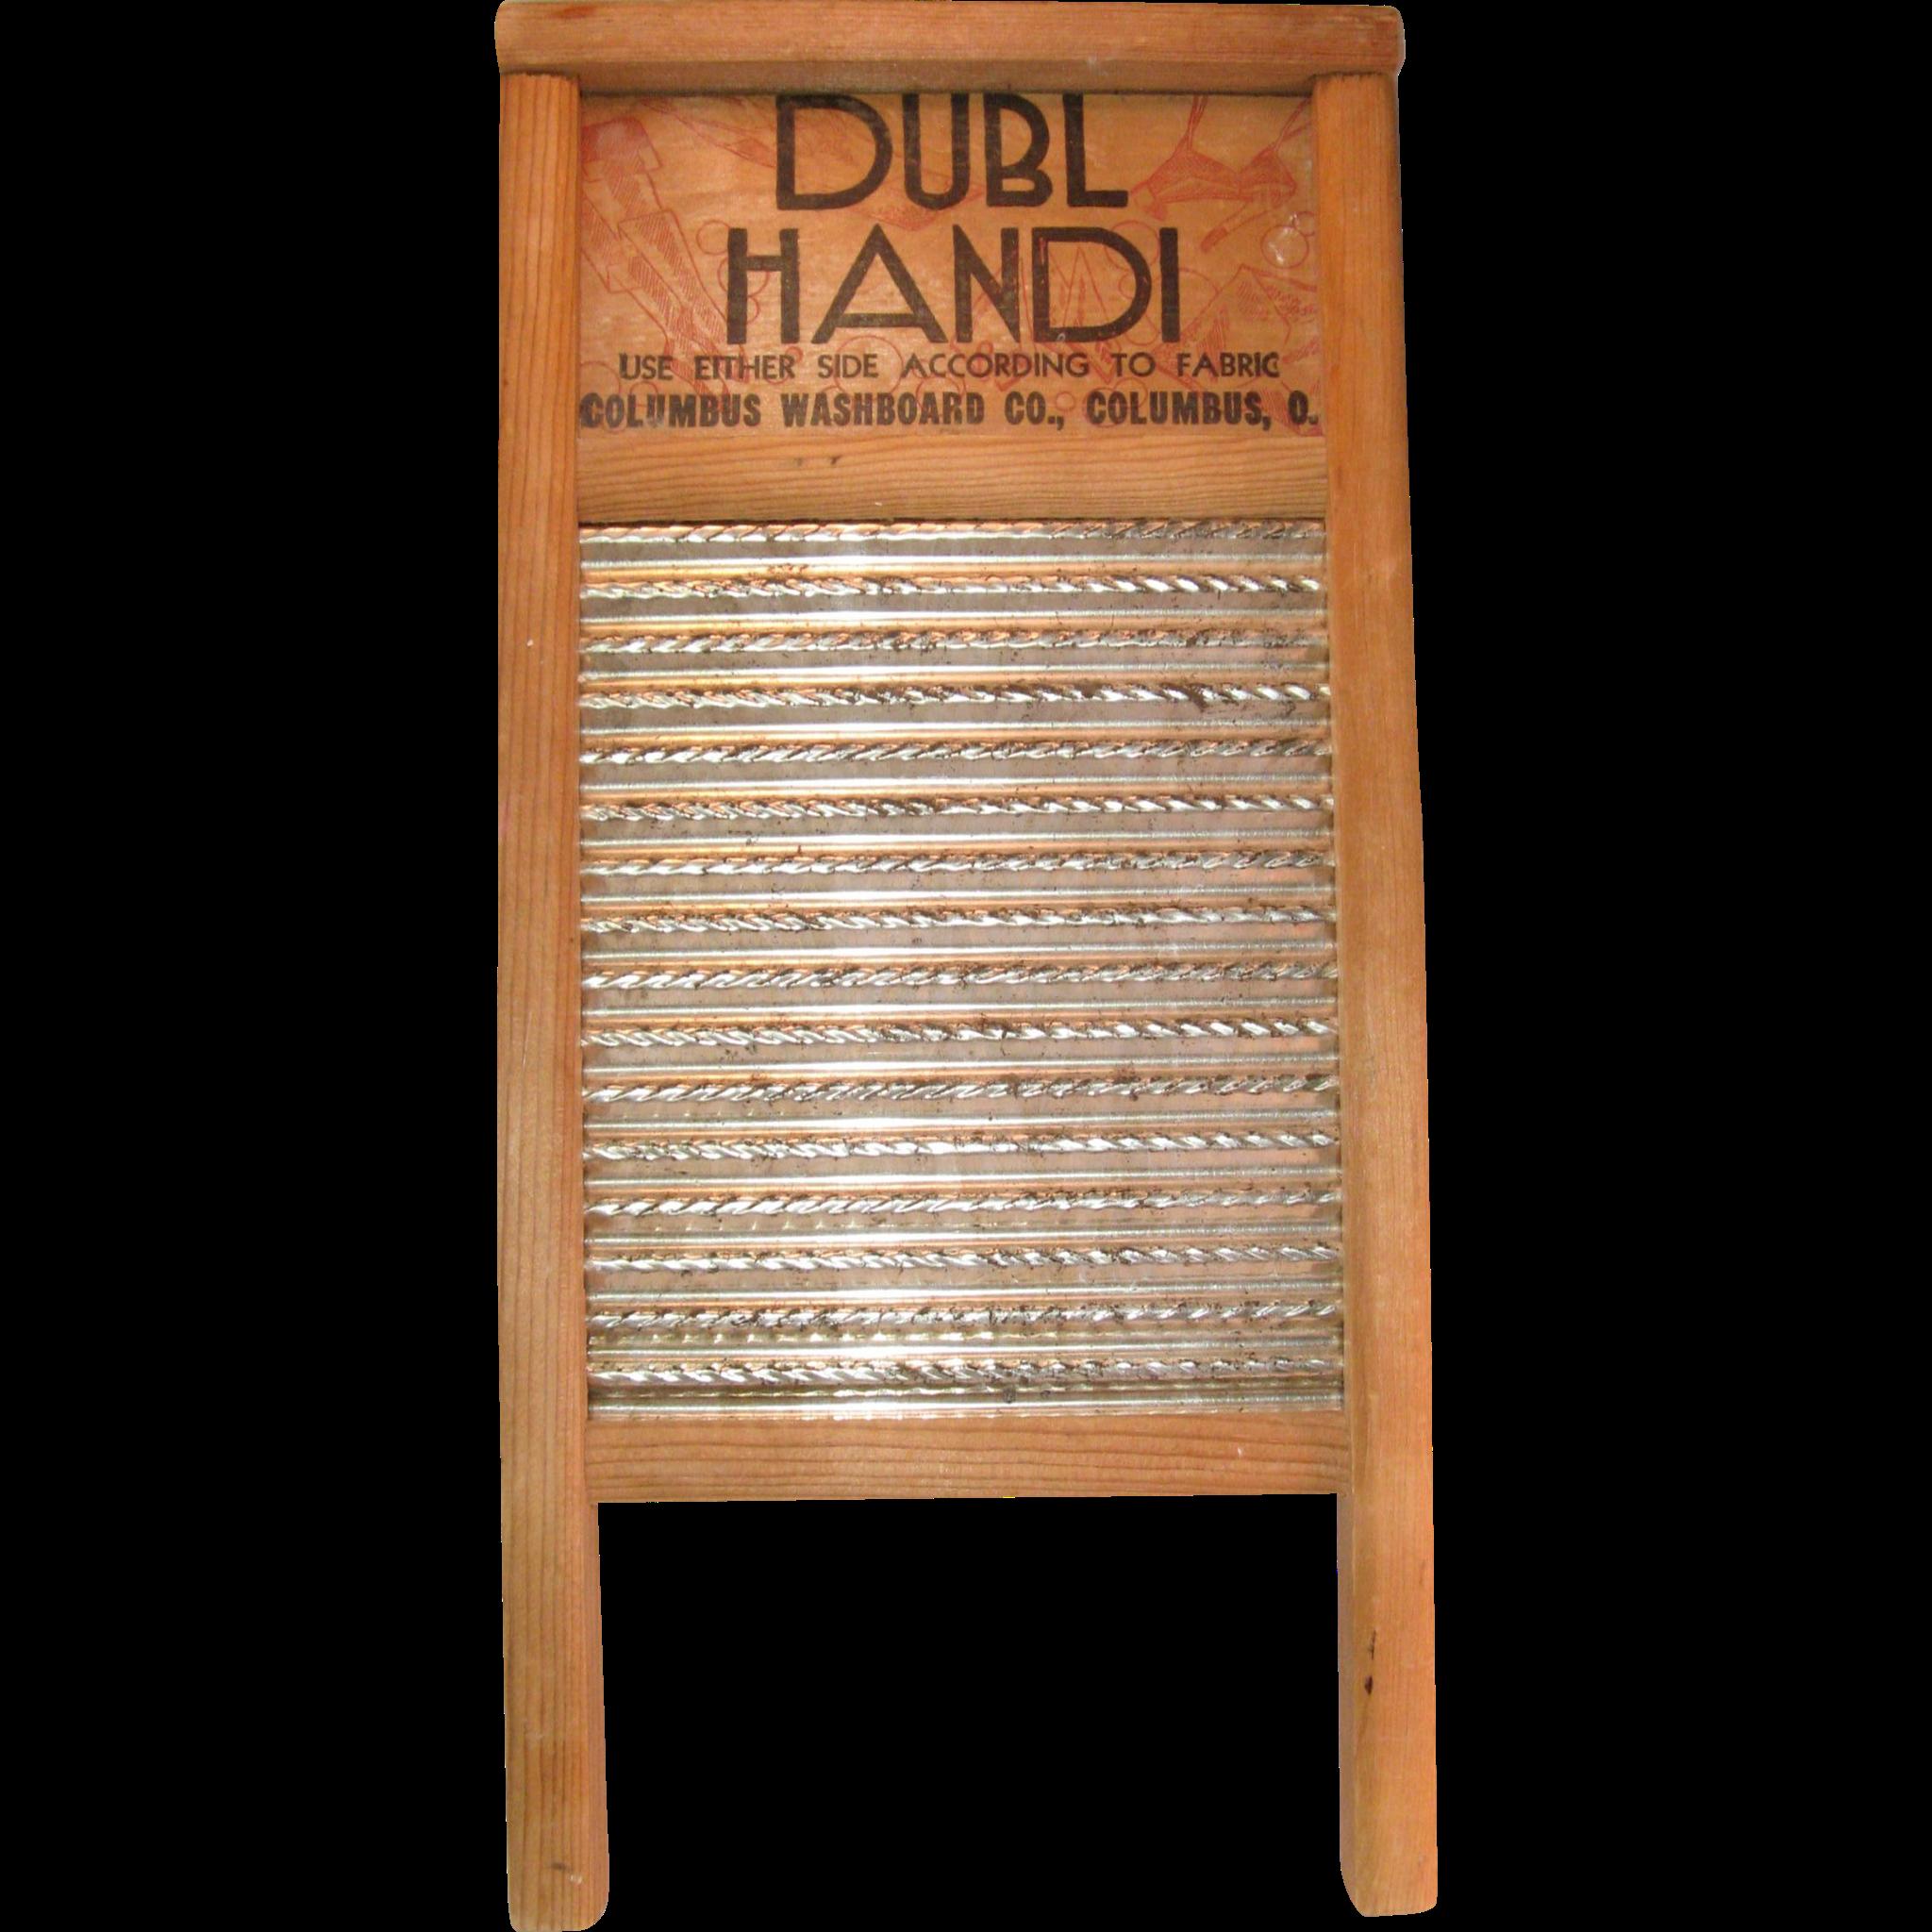 Vintage Dubl Handi Washboard Lingerie Hosiery Columbus